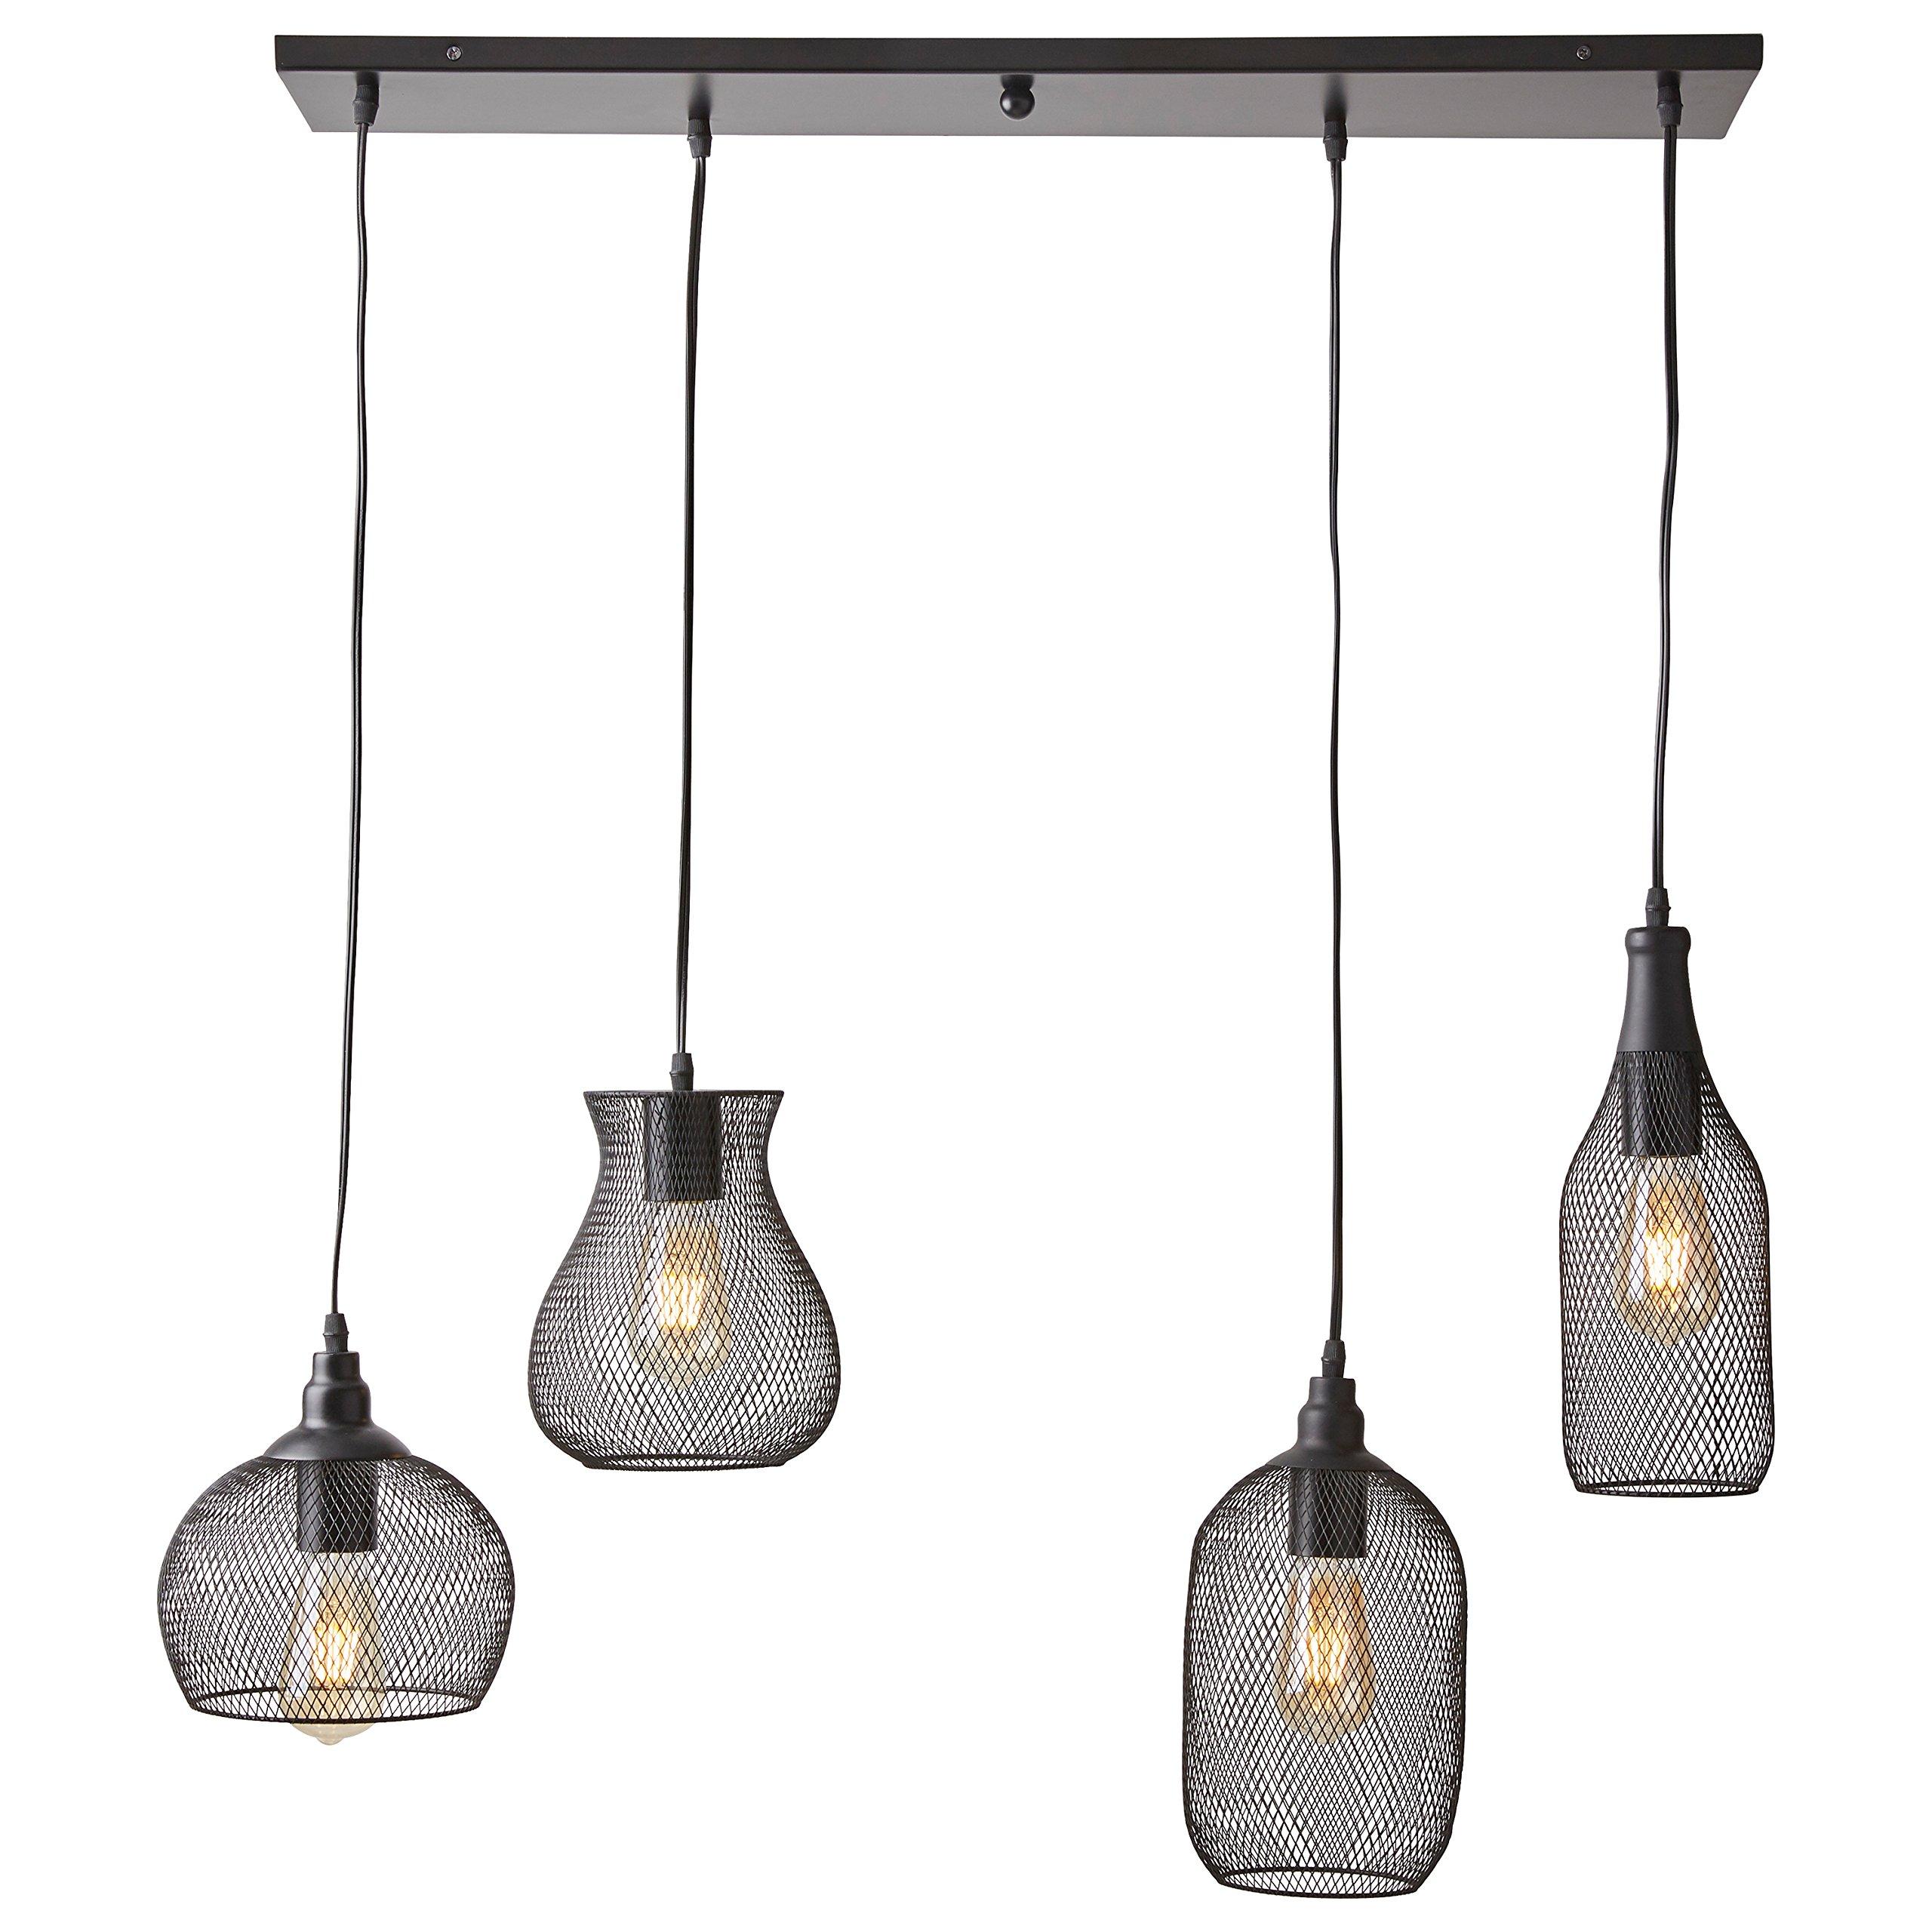 Stone & Beam Mesh 4-Light Pendant Chandelier with Edison Bulbs, 40''H, Black